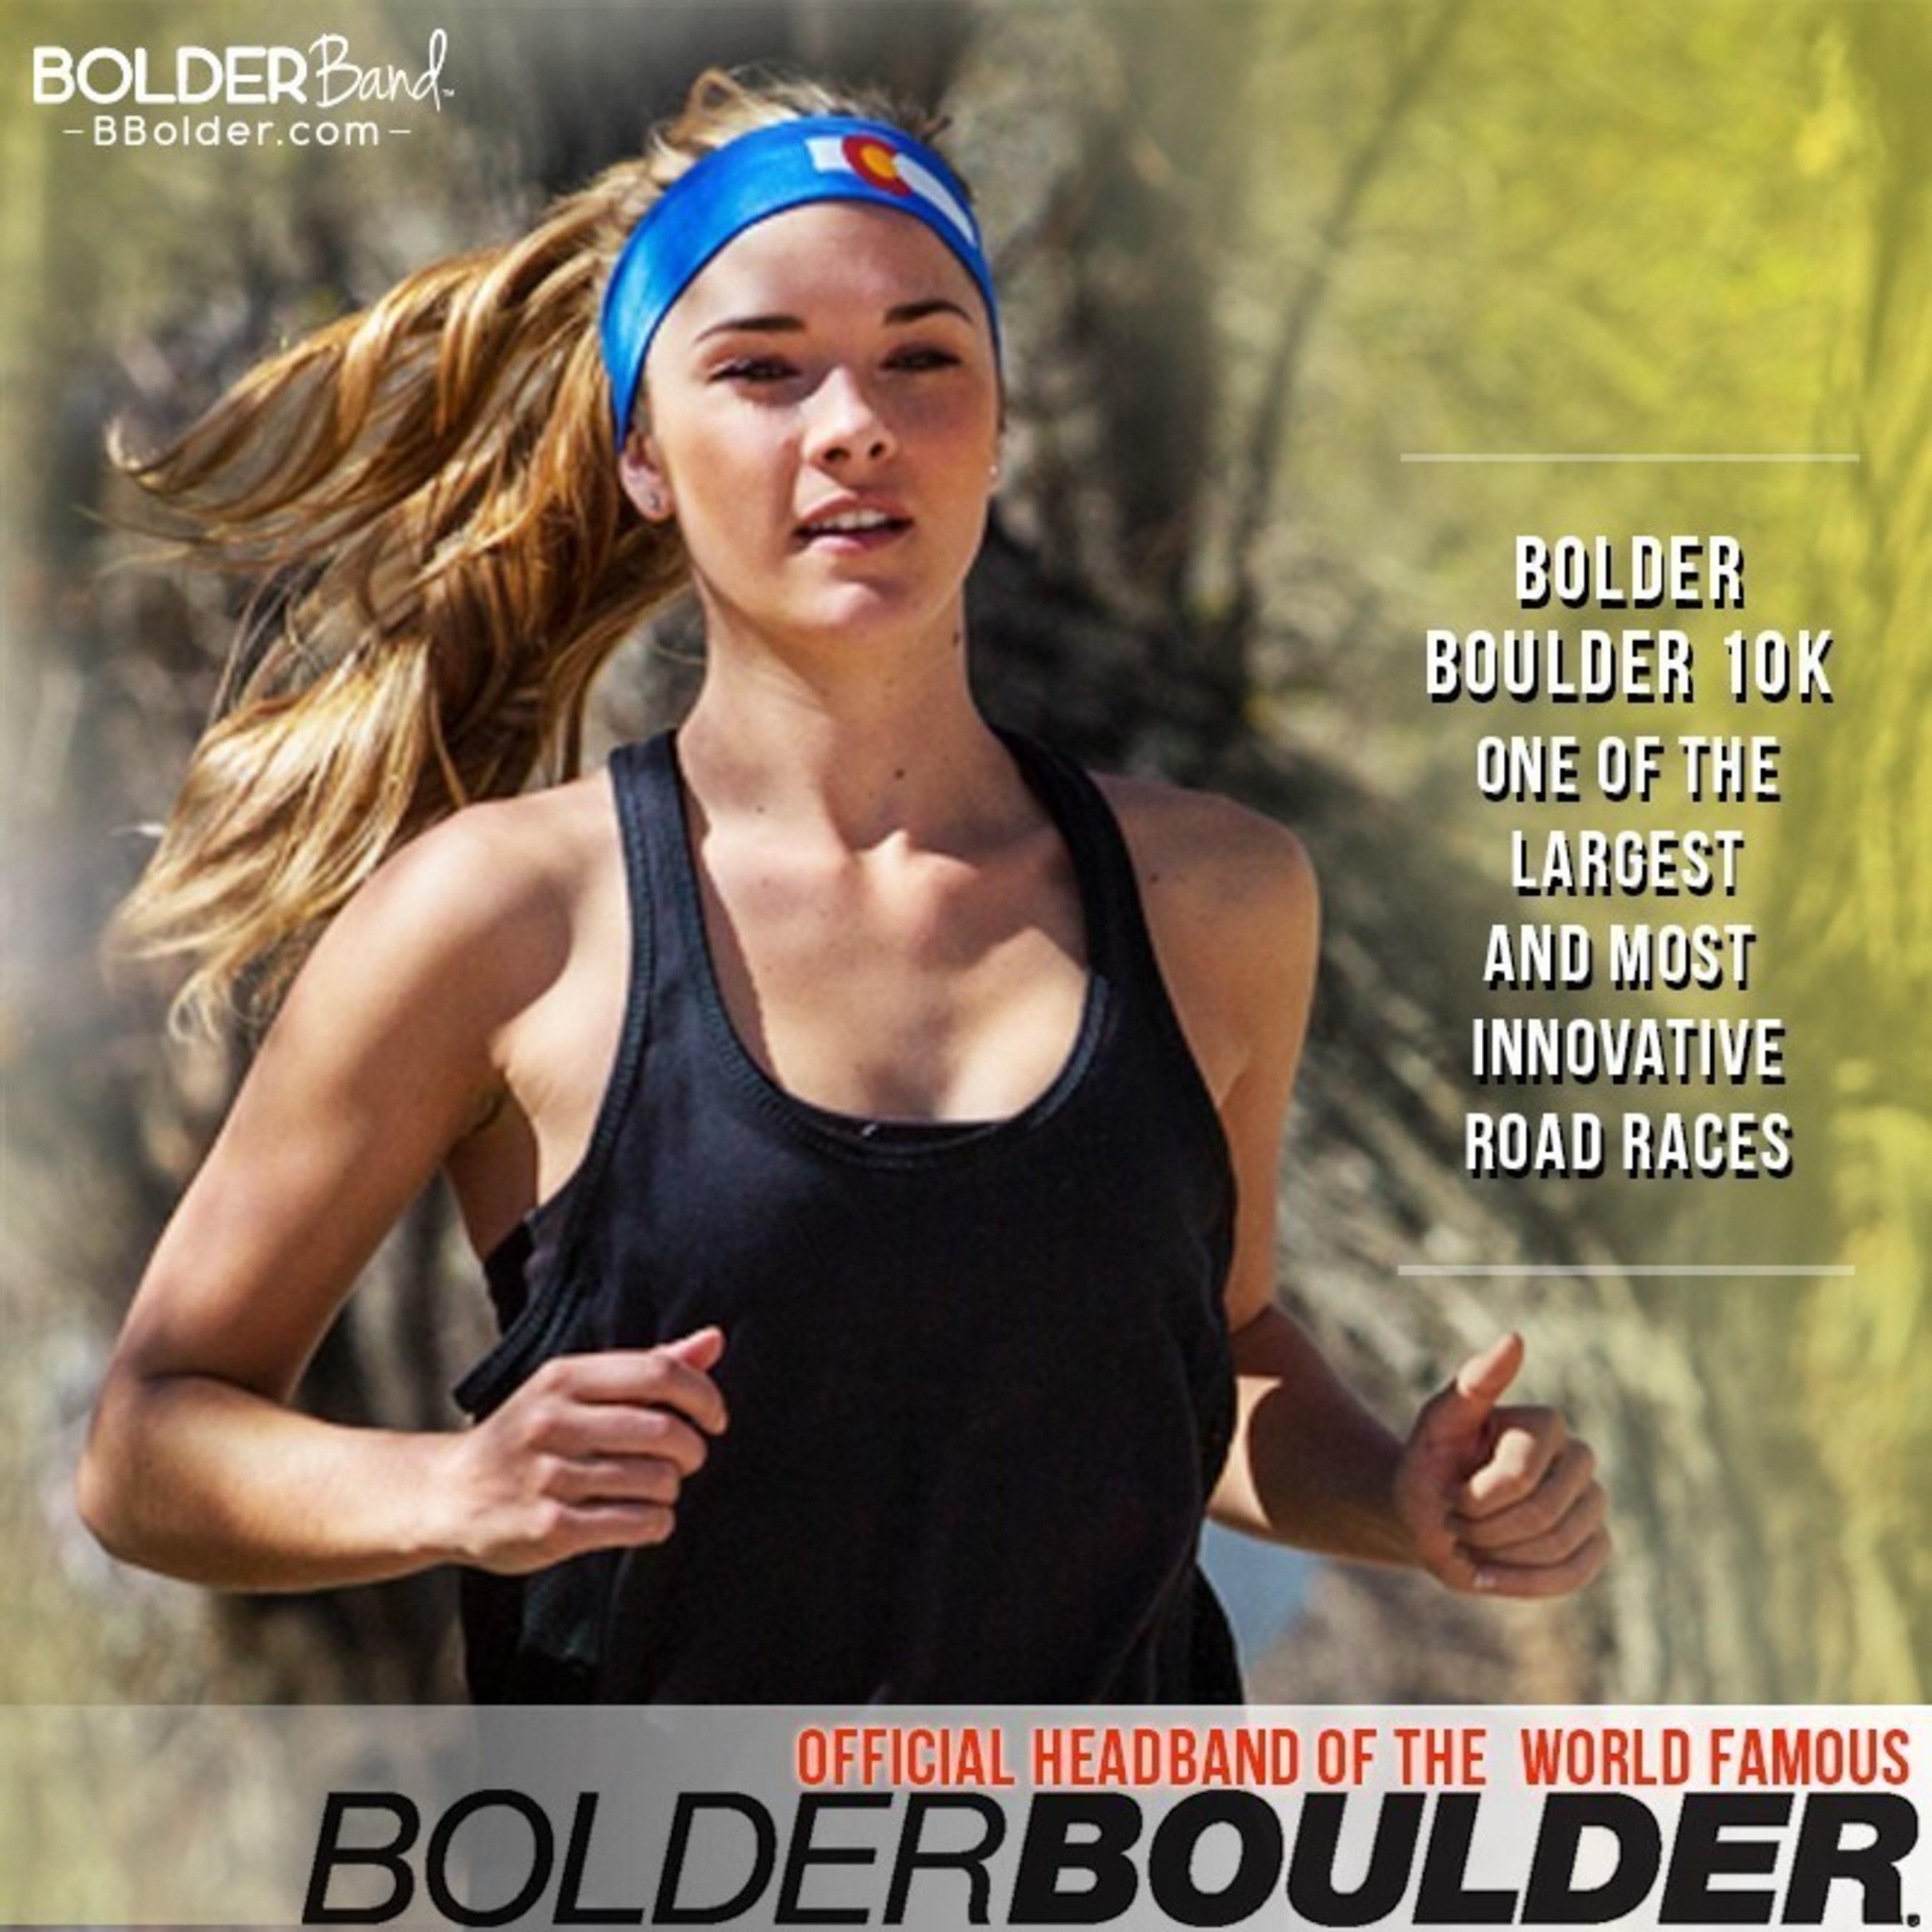 BolderBoulder Bolder Band Headband Official Headband of the BolderBoulder